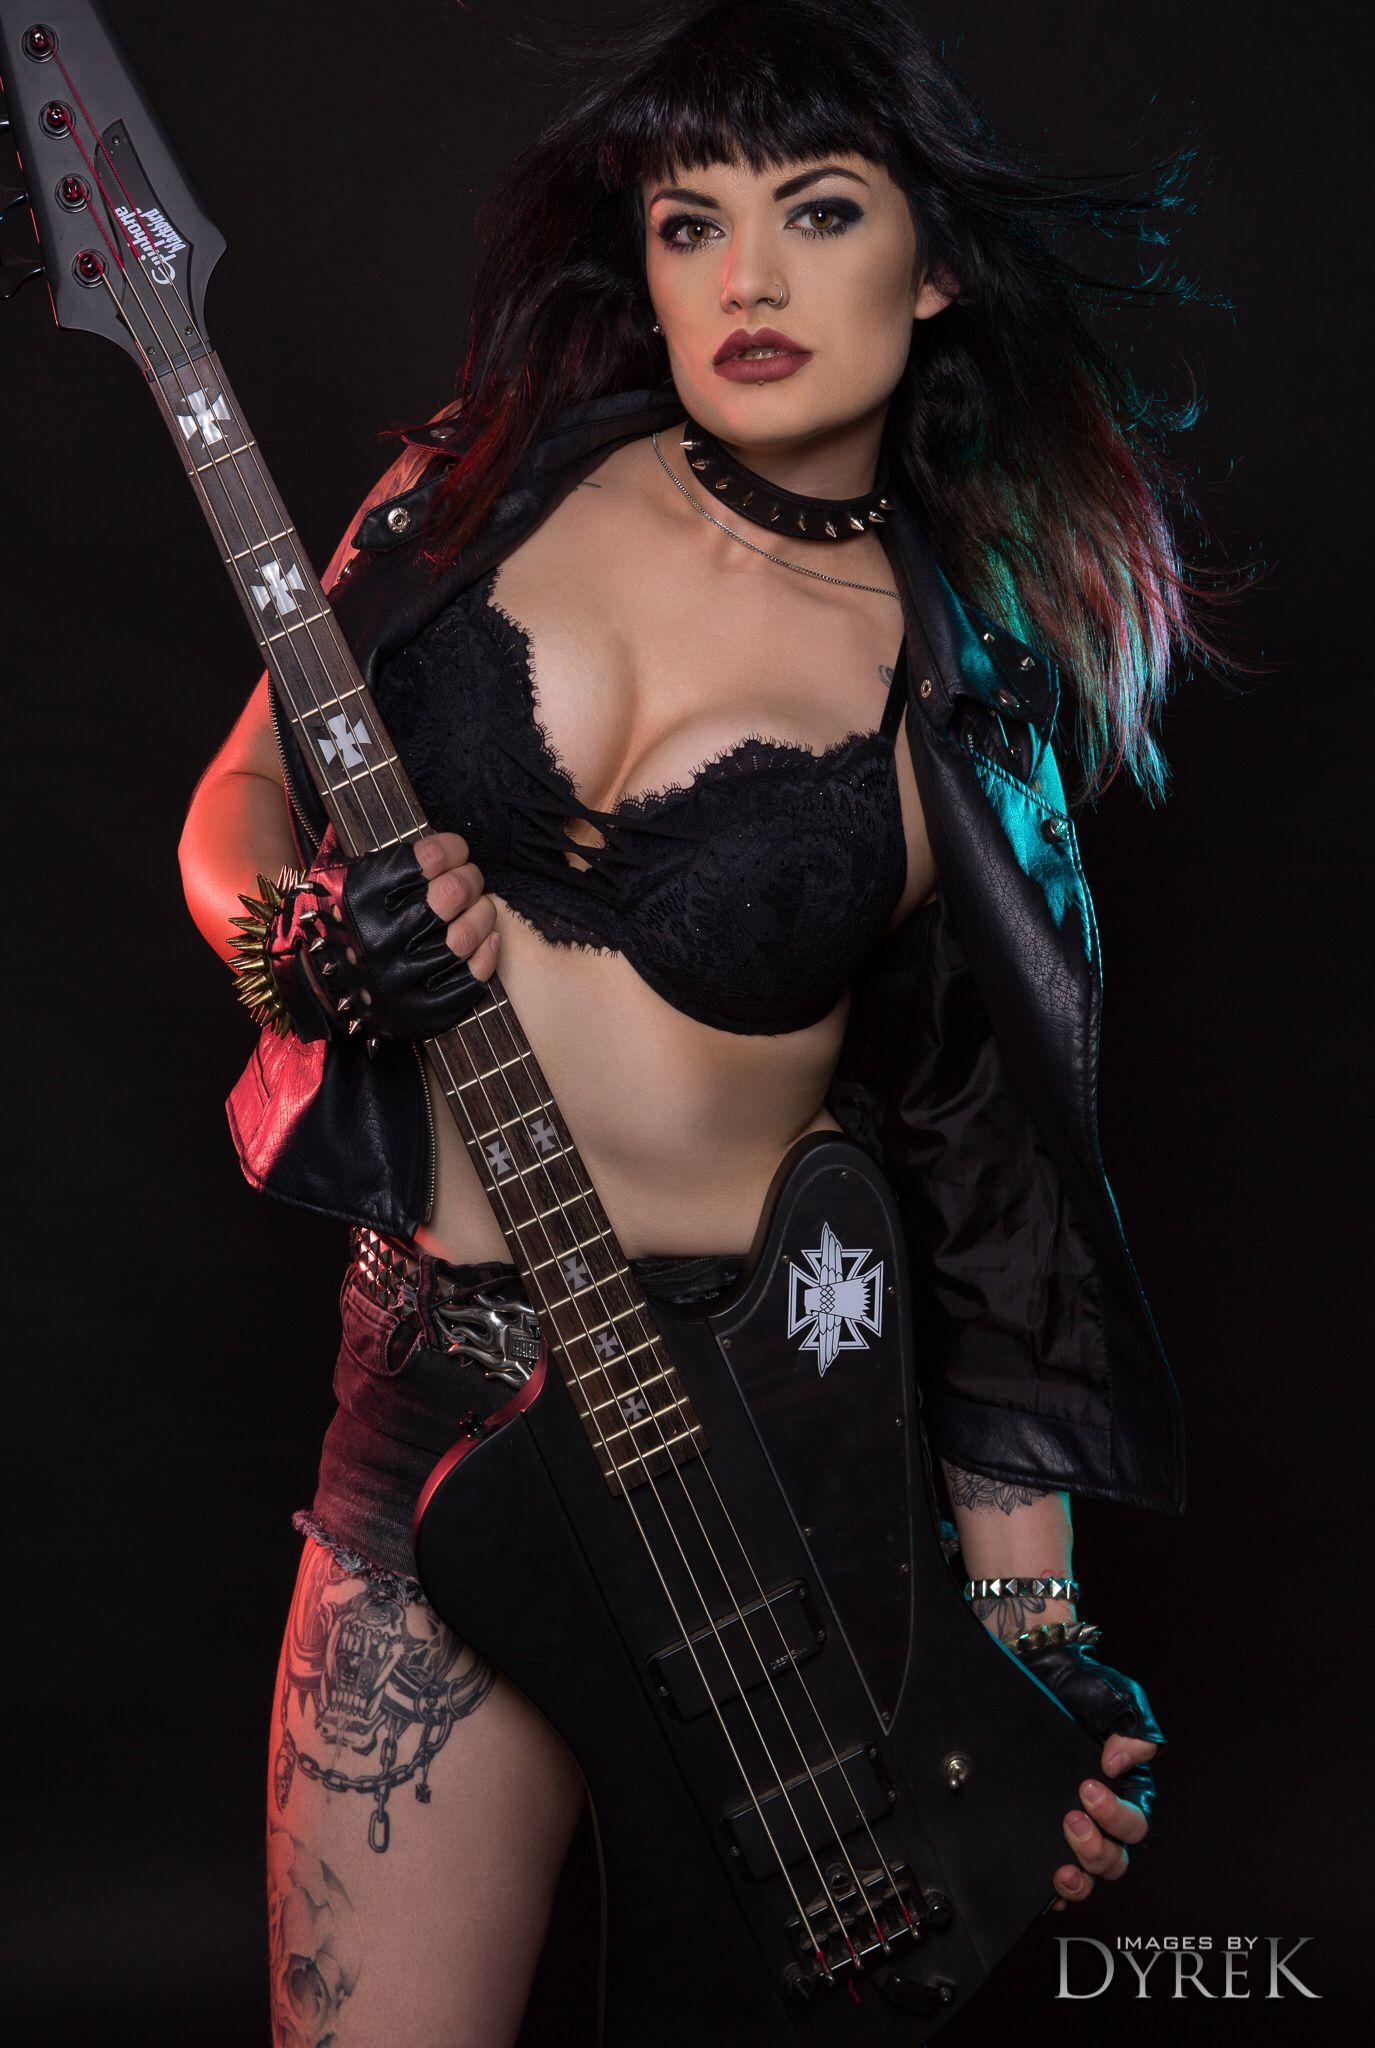 camera-busty-metal-guitar-chick